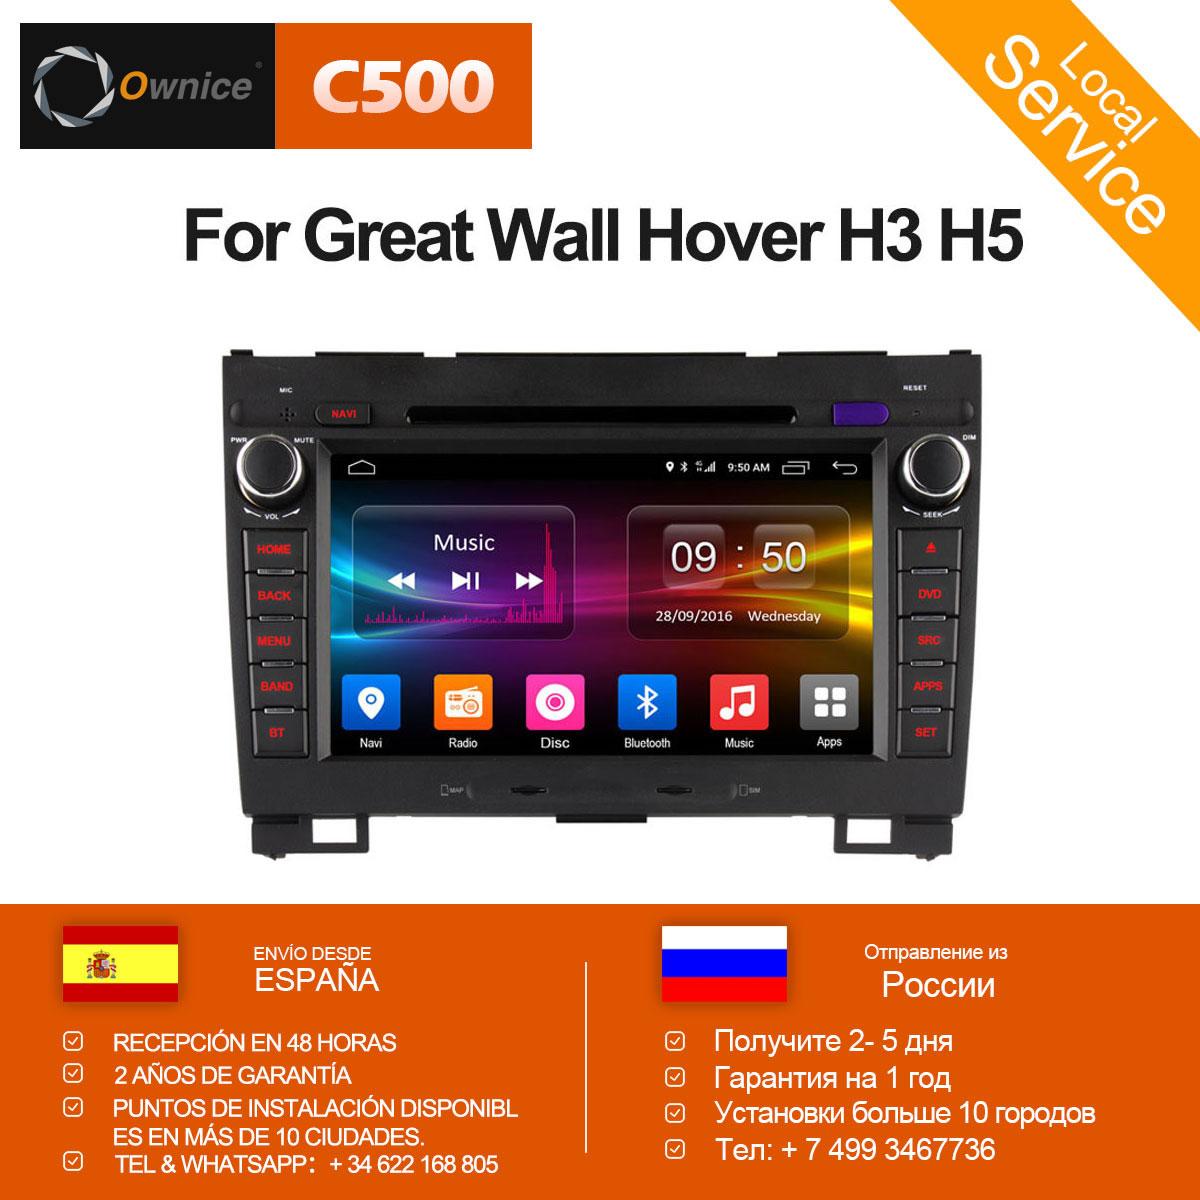 Ownice C500 4g SIM LTE Android 6.0 Quad Core lettore dvd Dell'automobile per Greatwall Haval Hover H5 H3 gps navi Radio WIFI 2 gb di RAM 32 gb